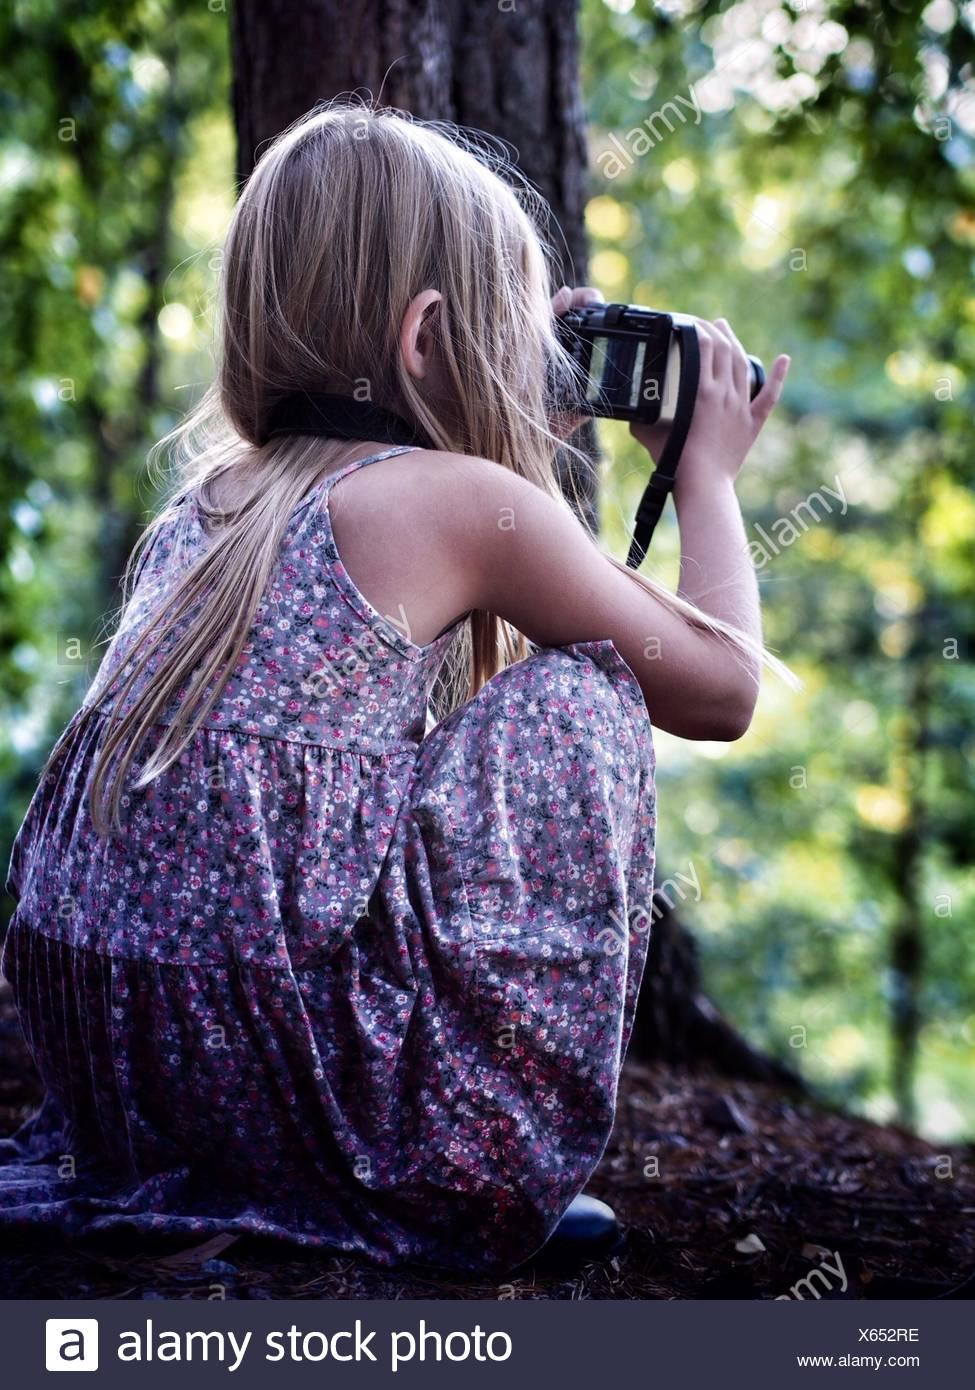 Sweden, (8-9 years) Girl taking photo - Stock Image